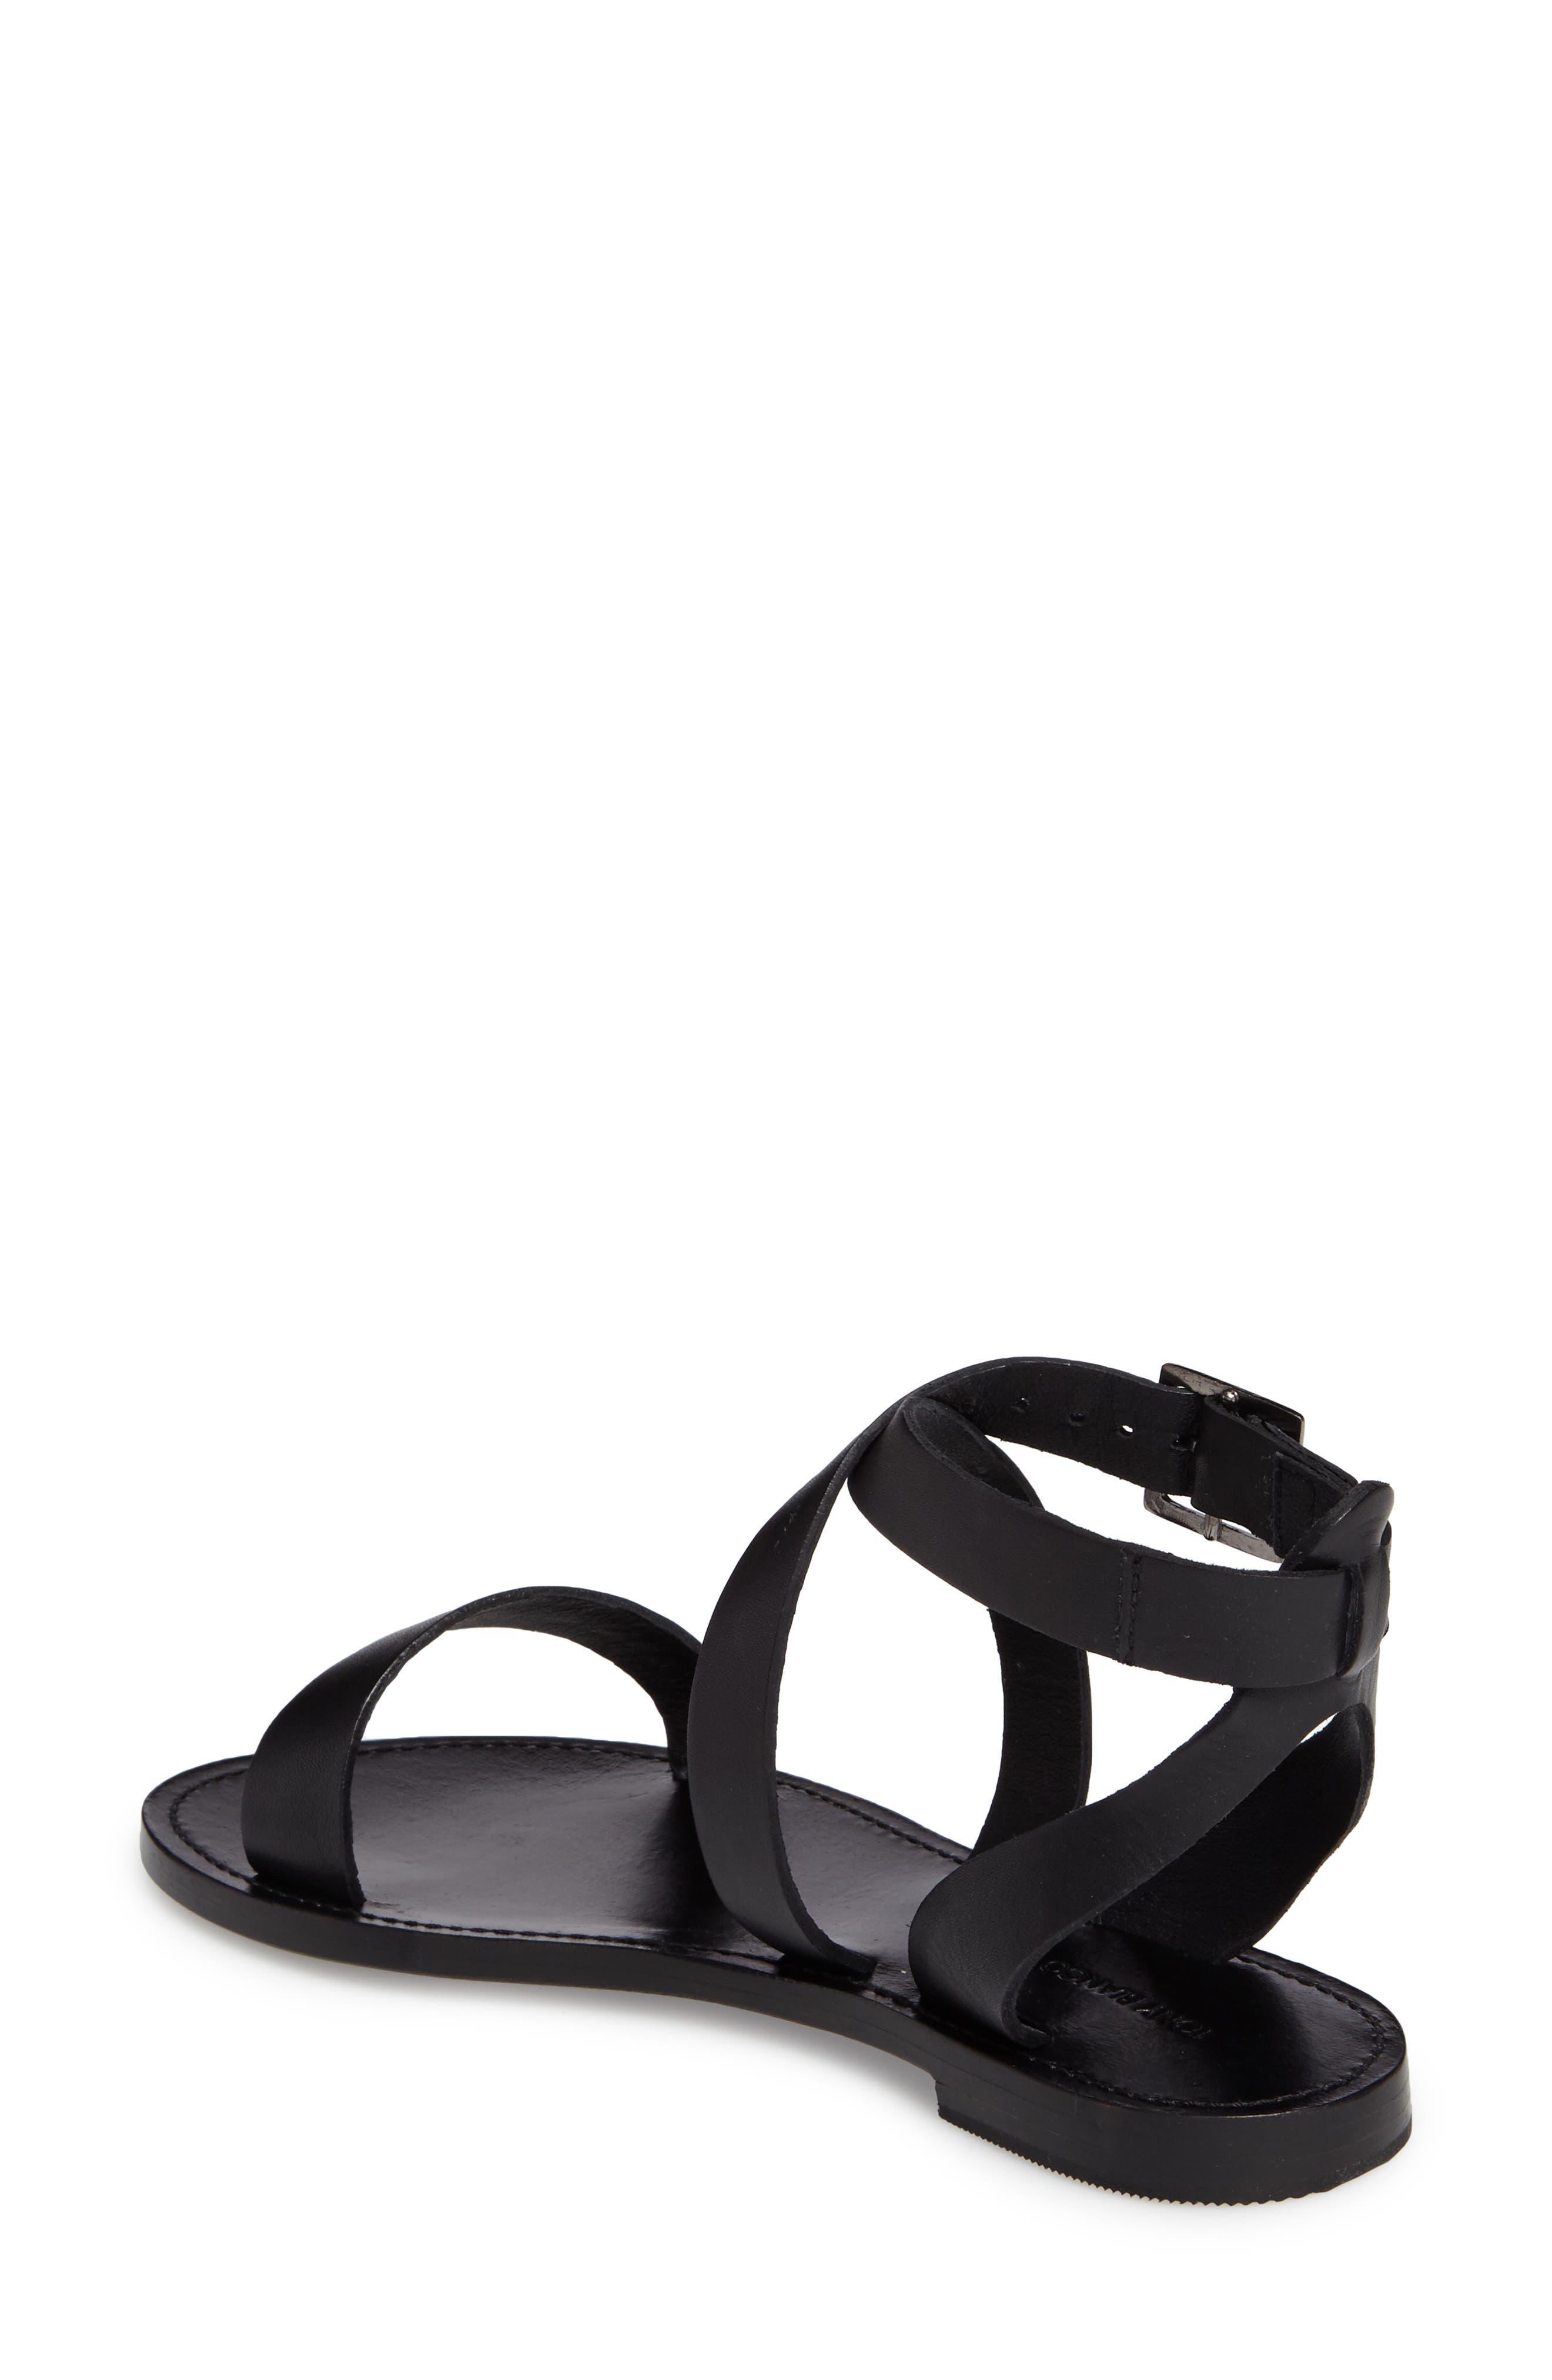 Alternate Image 2  - Tony Bianco Flo Ankle Strap Sandal (Women)